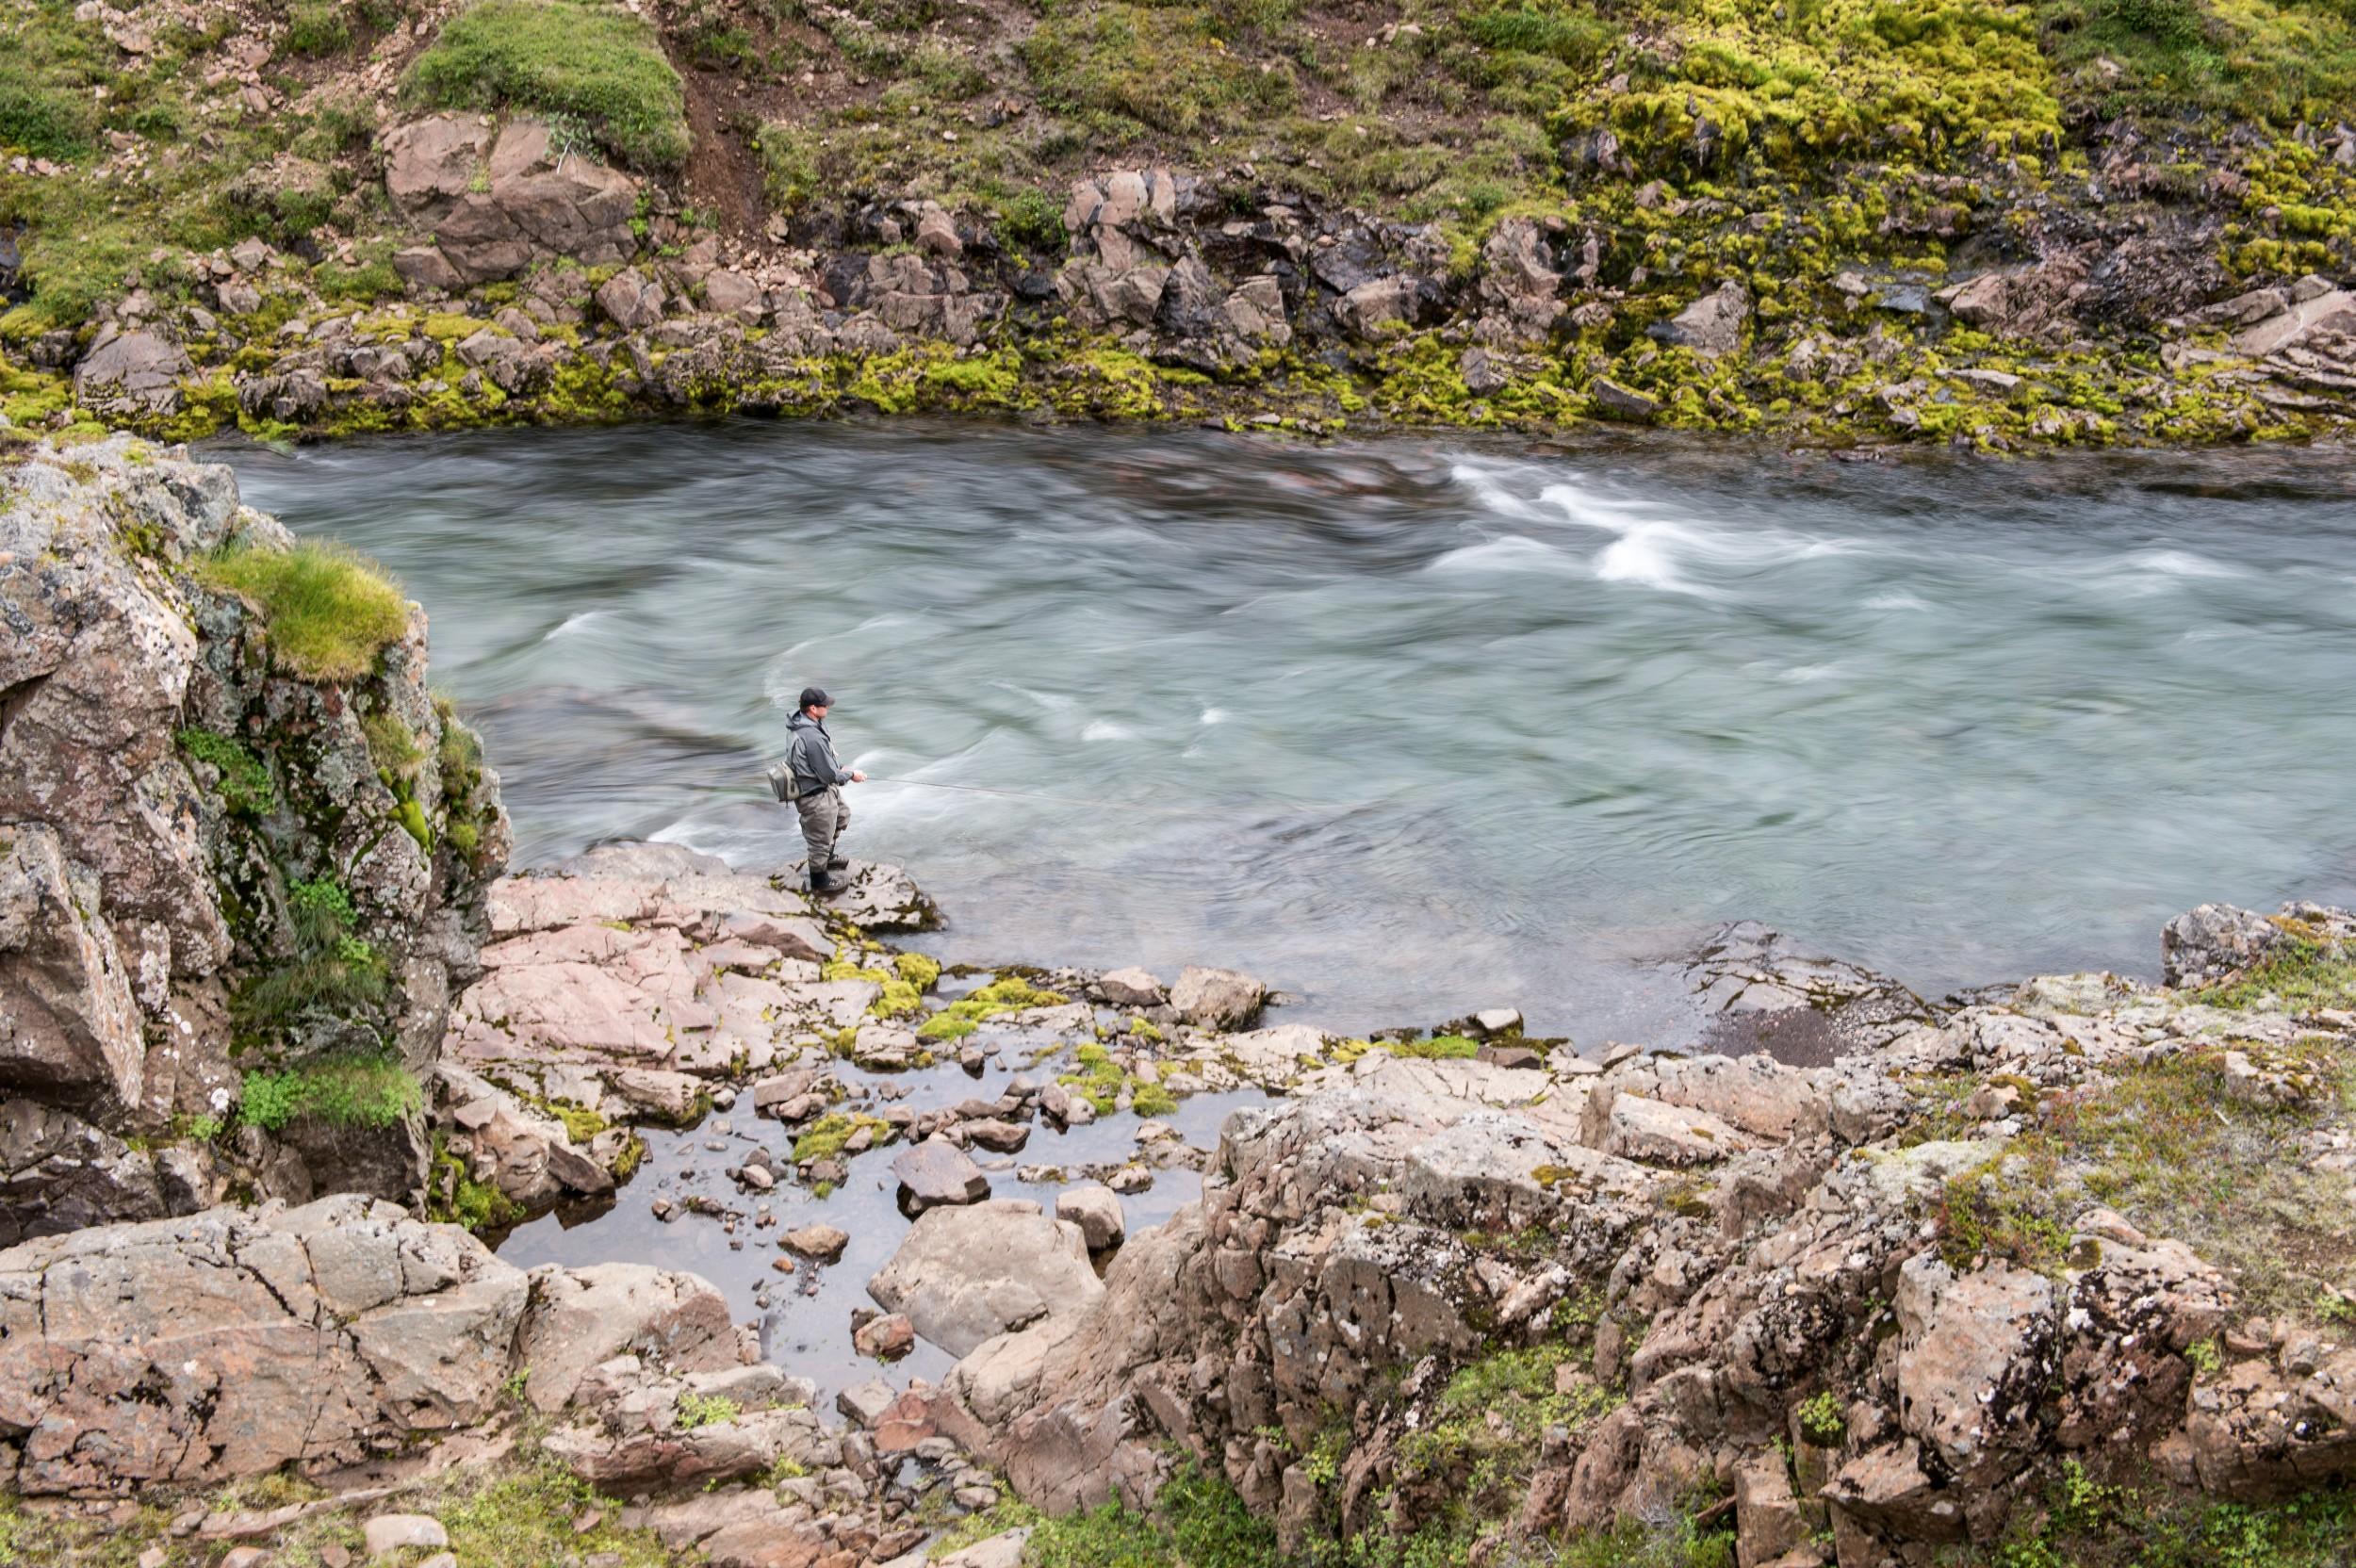 Iceland_Fish_8.jpg